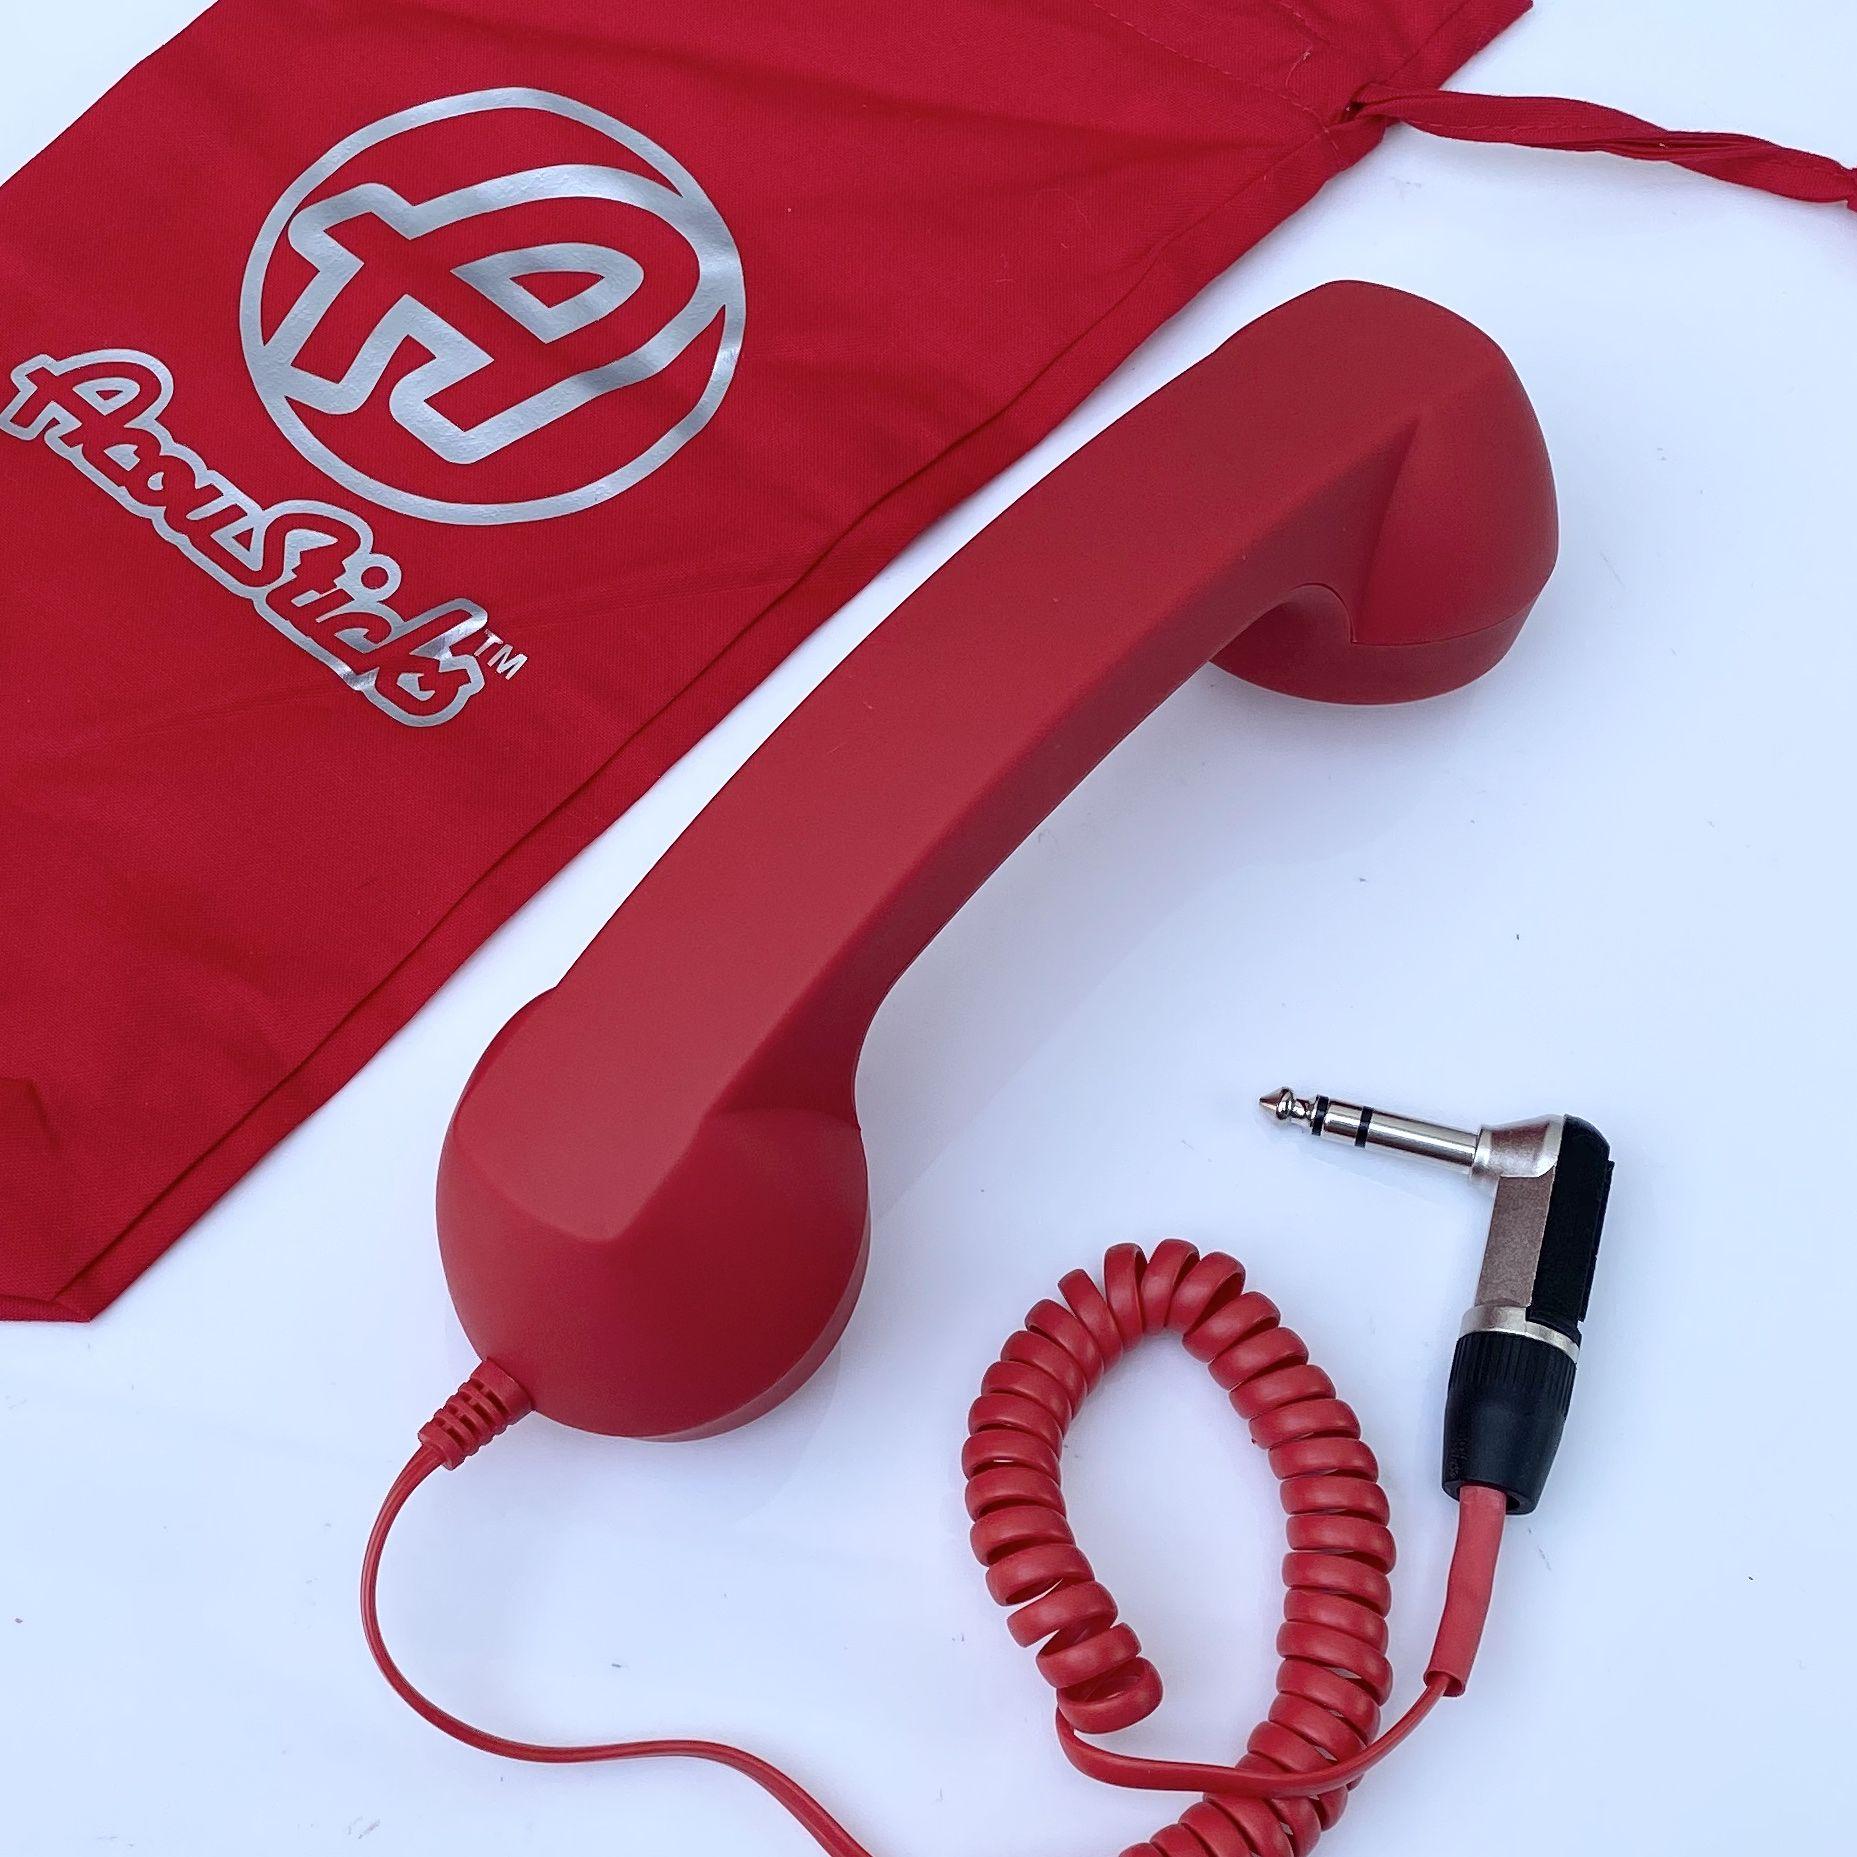 DJ telephone